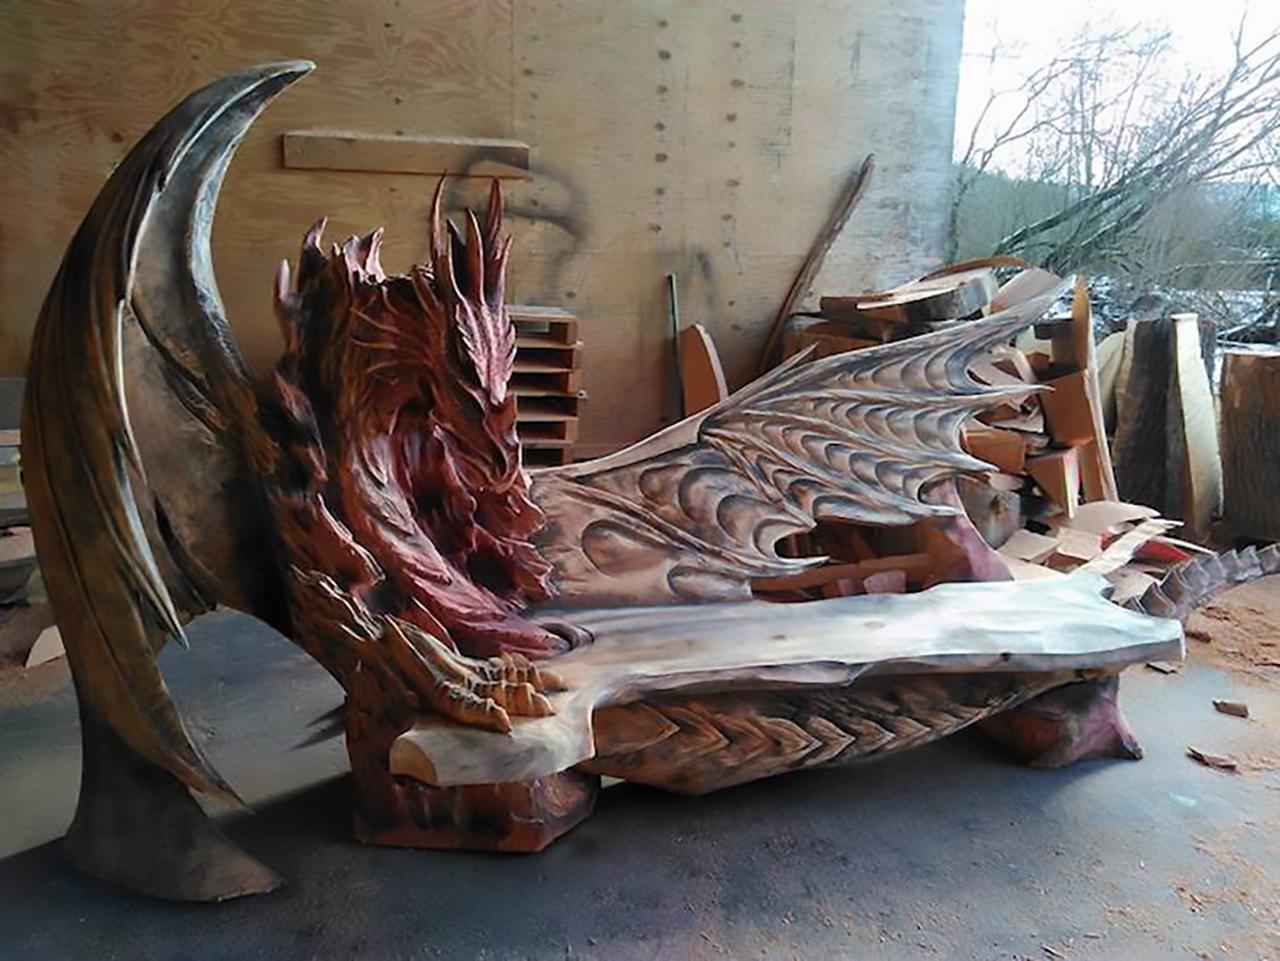 igor-loskutow-chainsaw-art-dragon-bench2-4